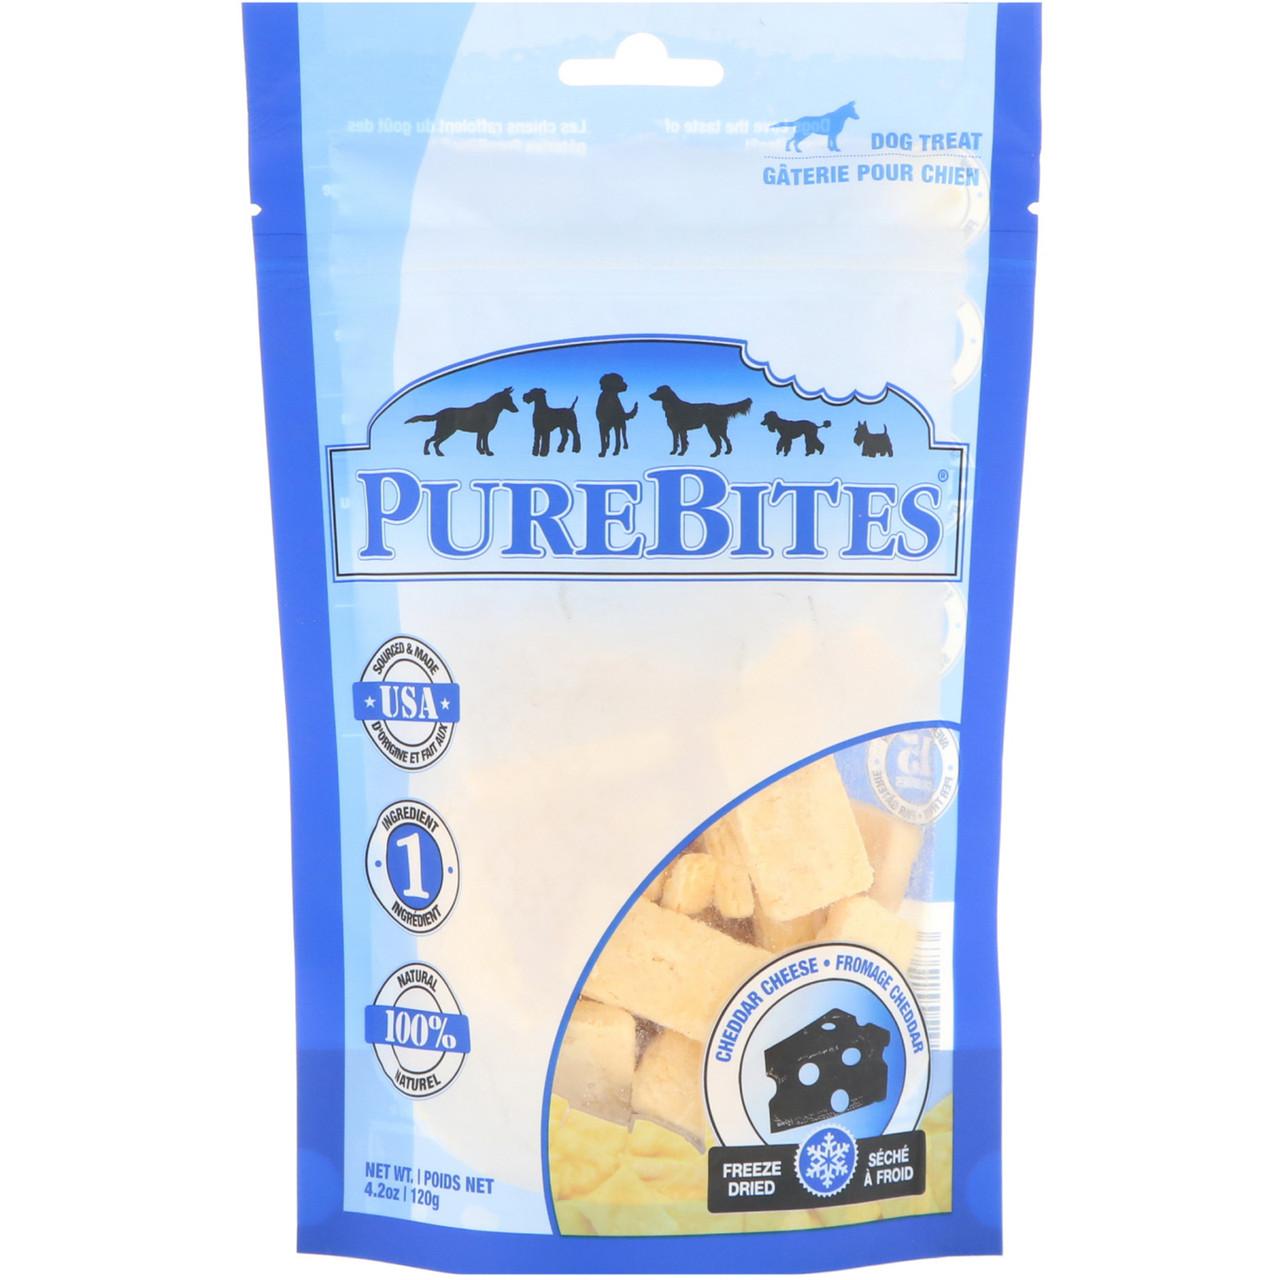 Pure Bites, Freeze Dried, Dog Treats, Cheddar Cheese , 4.2 oz (120 g)